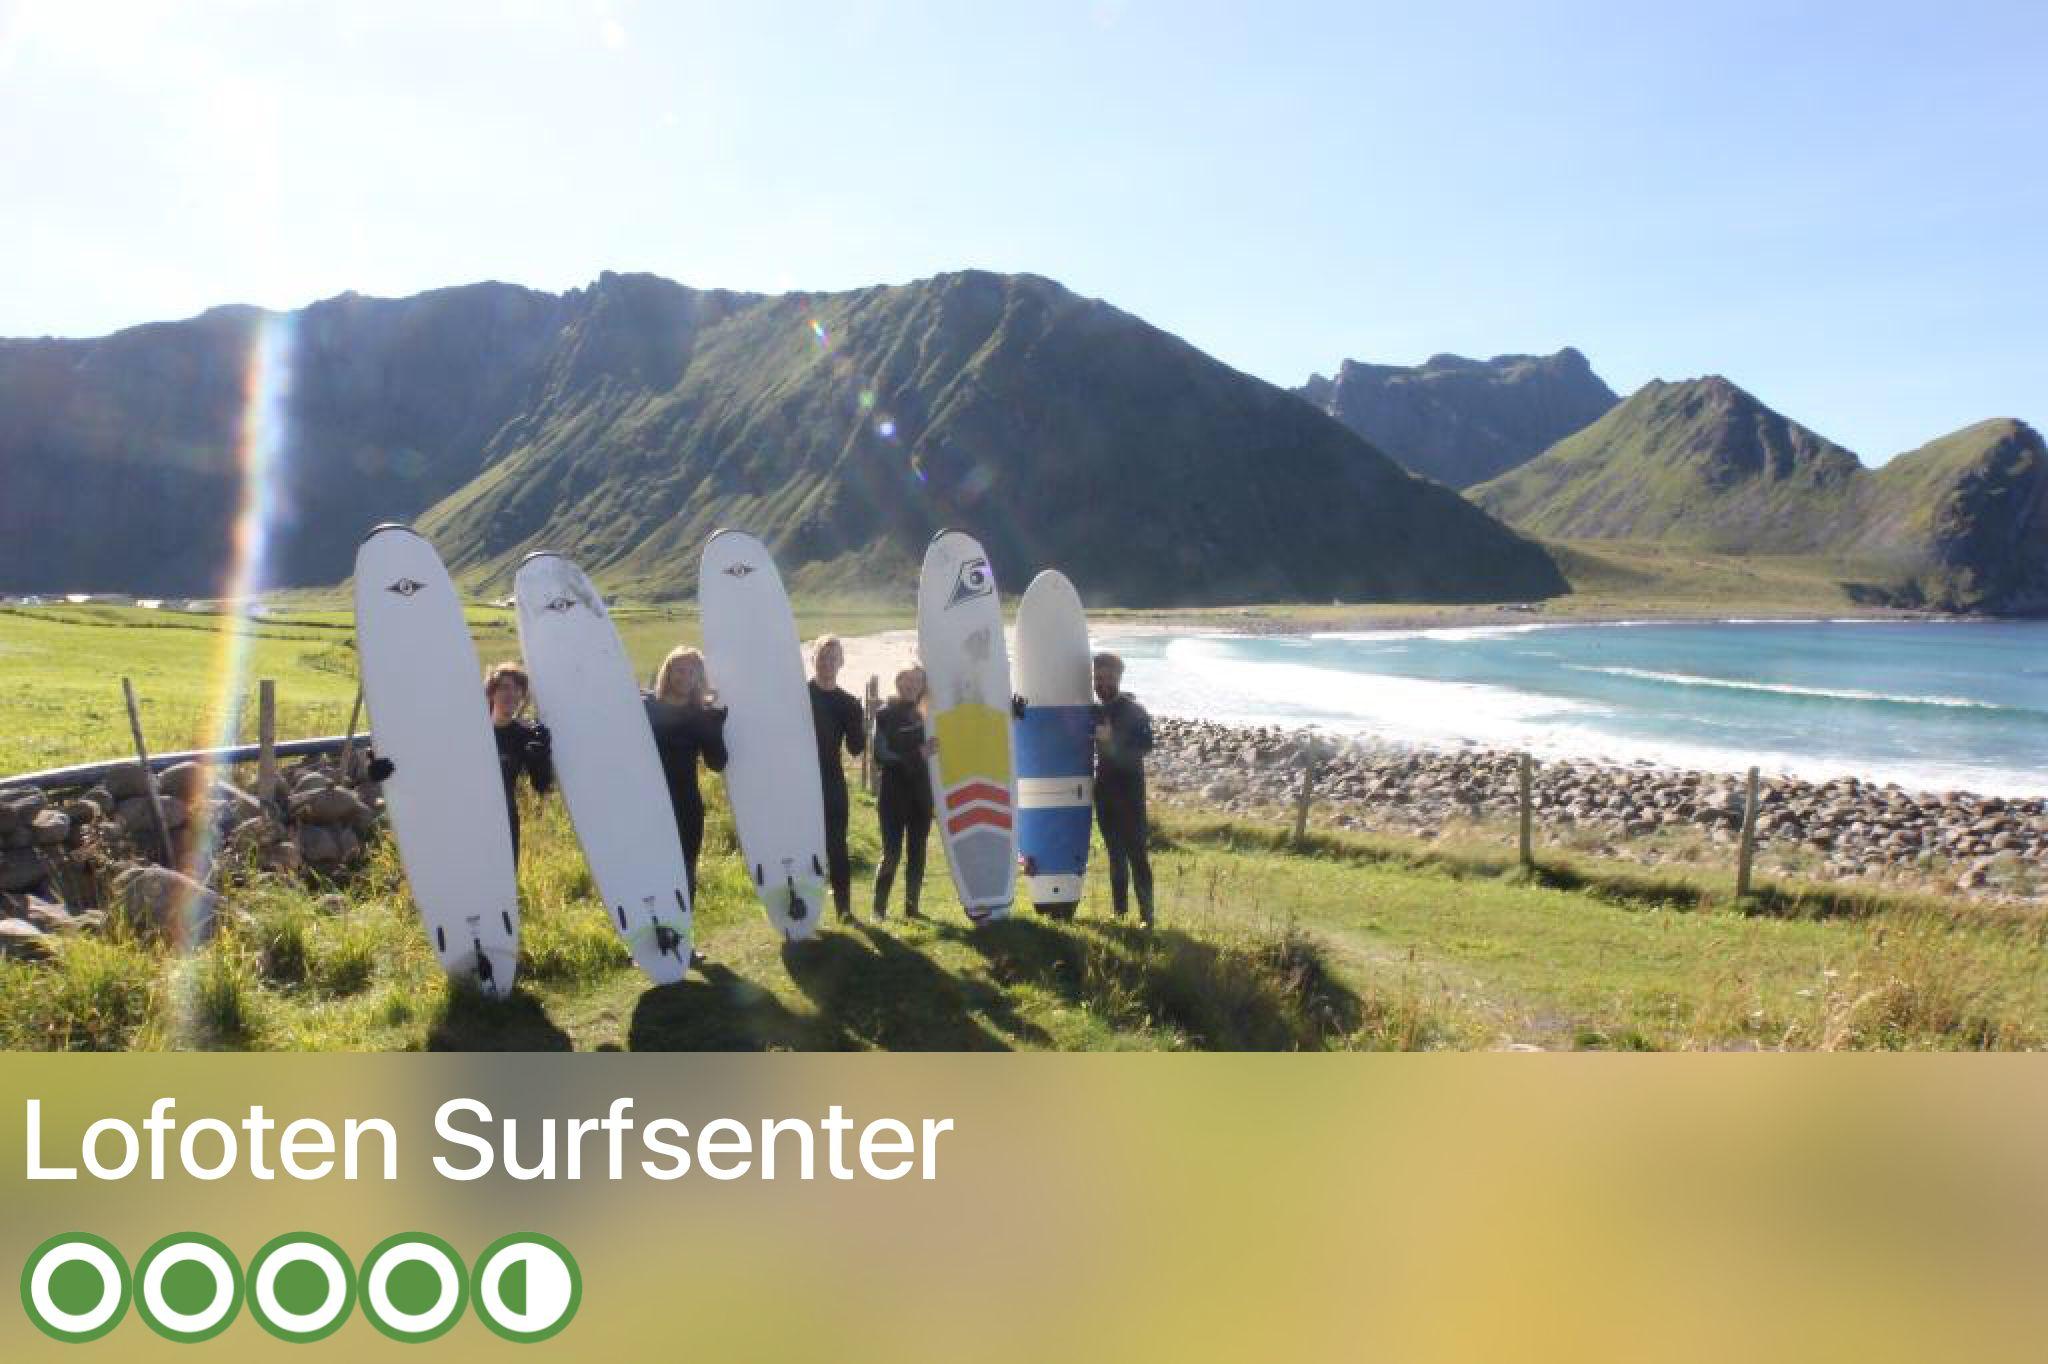 https://www.tripadvisor.com/Attraction_Review-g612448-d10025624-Reviews-Lofoten_Surfsenter-Vestvagoy_Lofoten_Islands_Nordland_Northern_Norway.html?m=19904